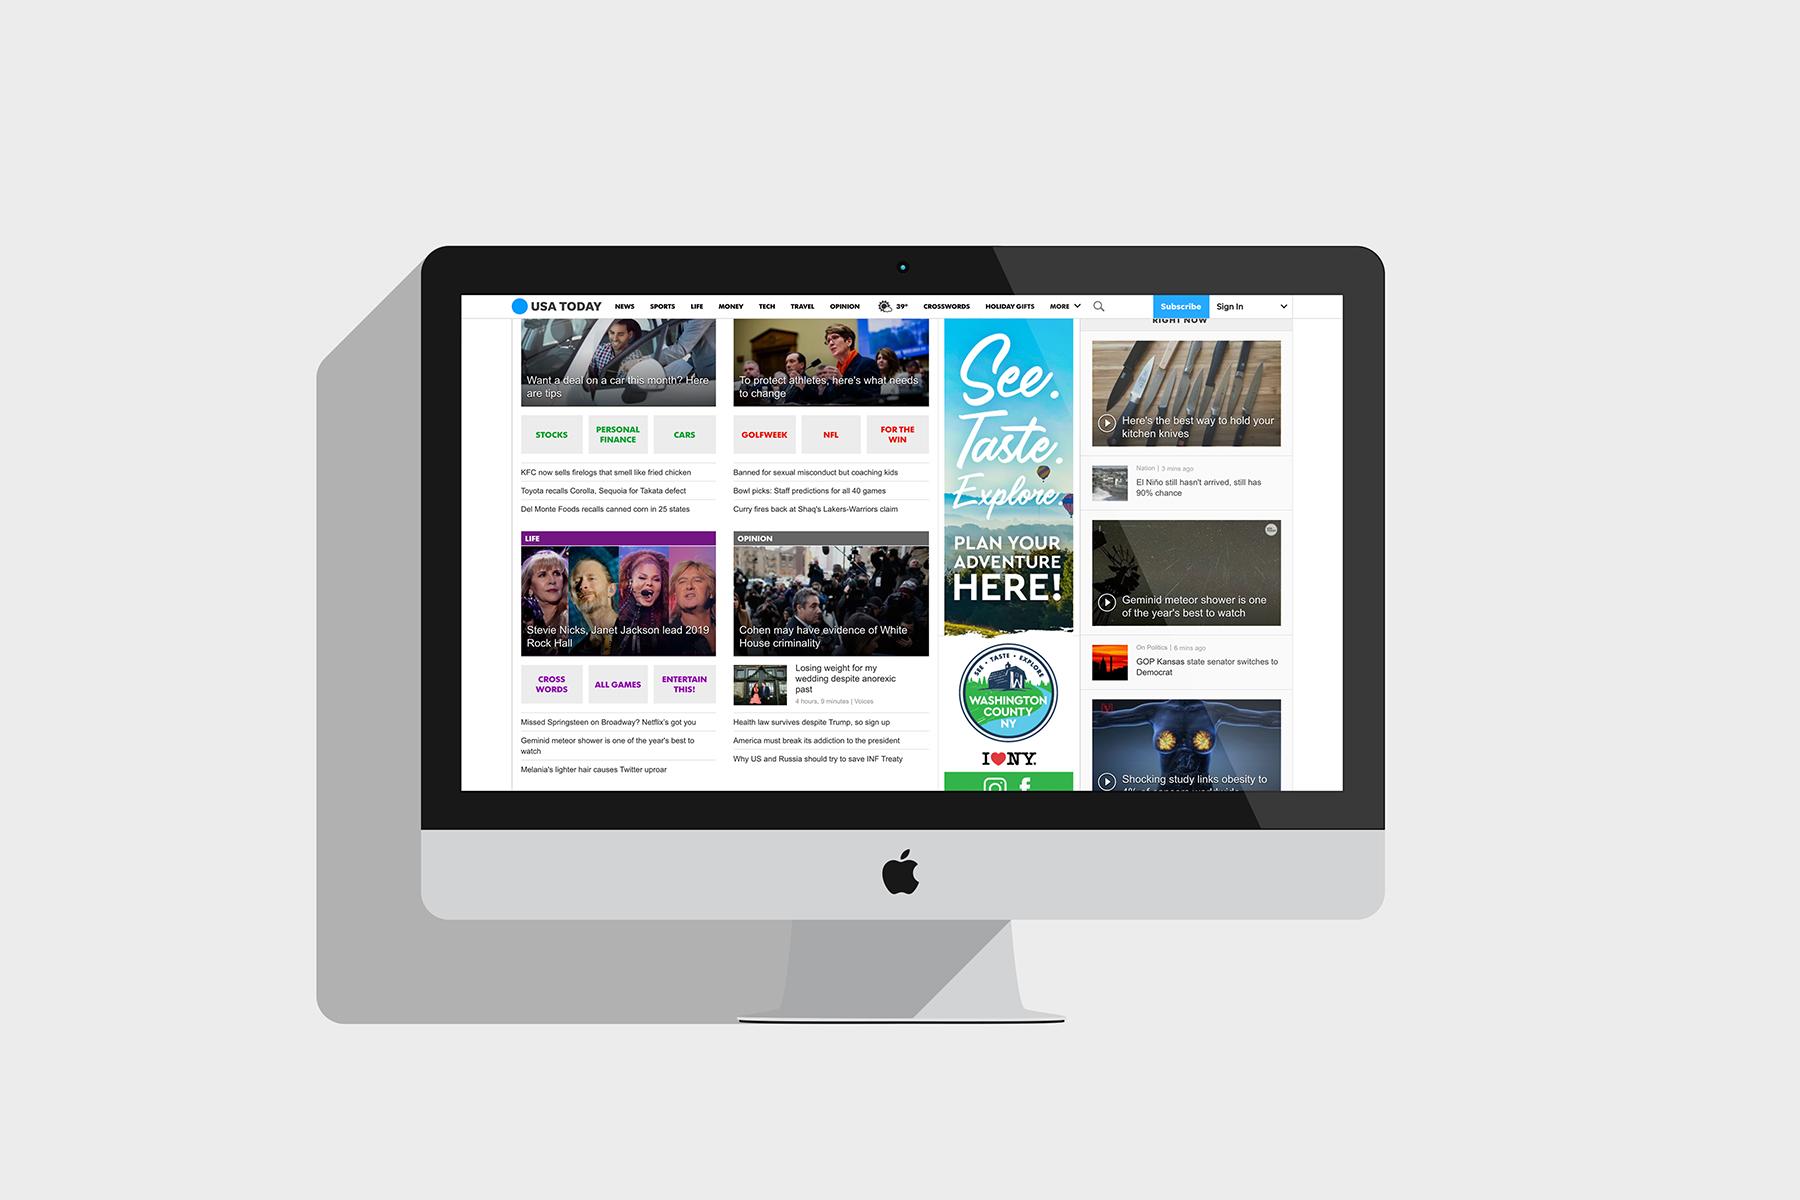 Marketing Content on Website